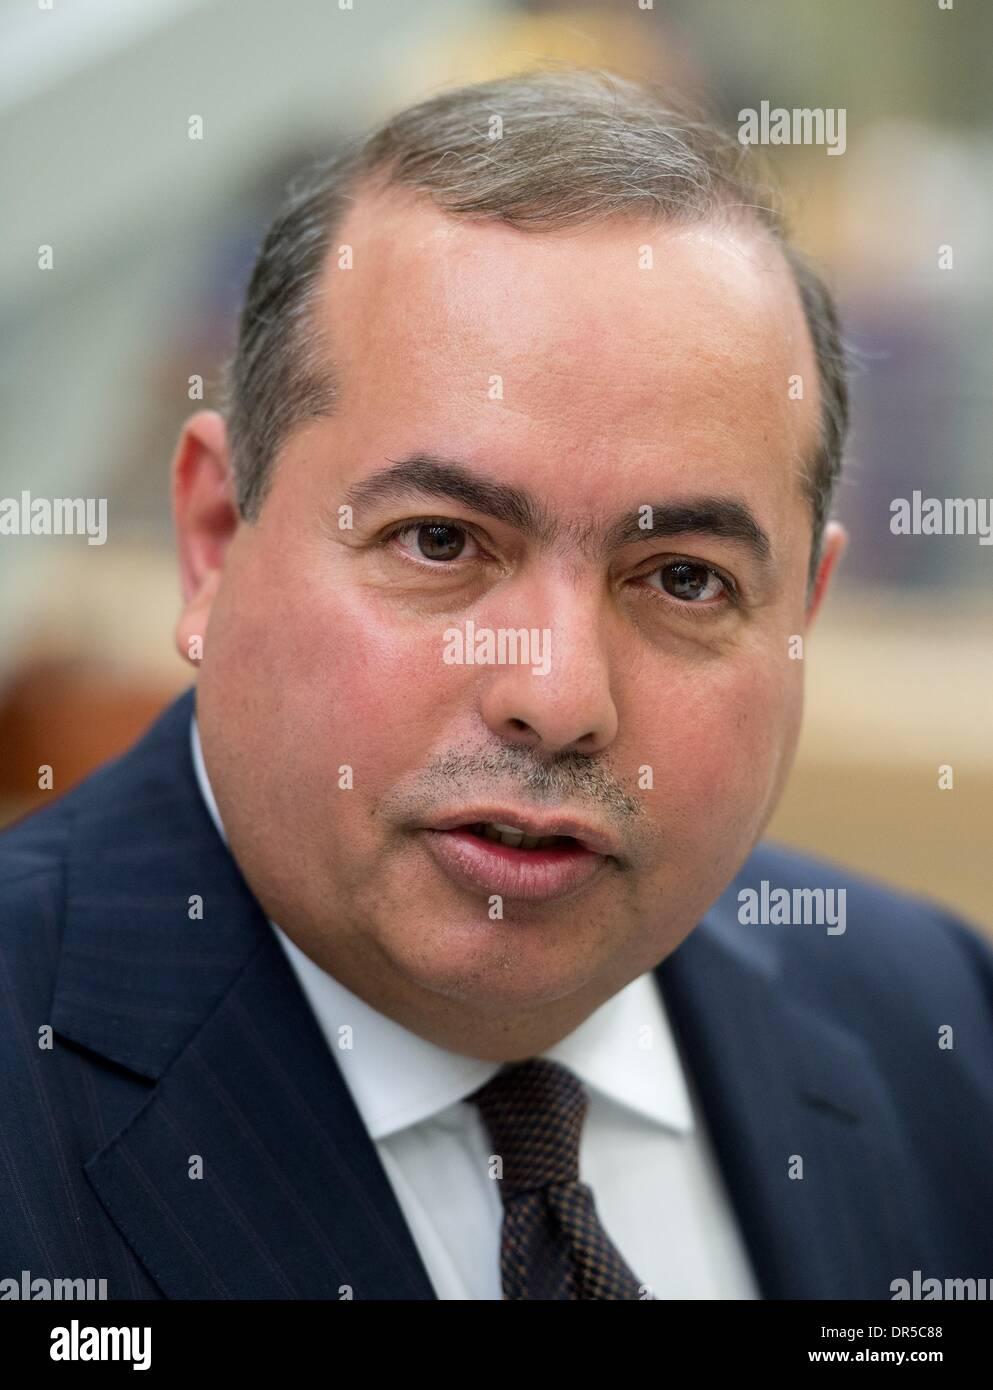 Al Turki Stock Photos & Al Turki Stock Images - Page 3 - Alamy